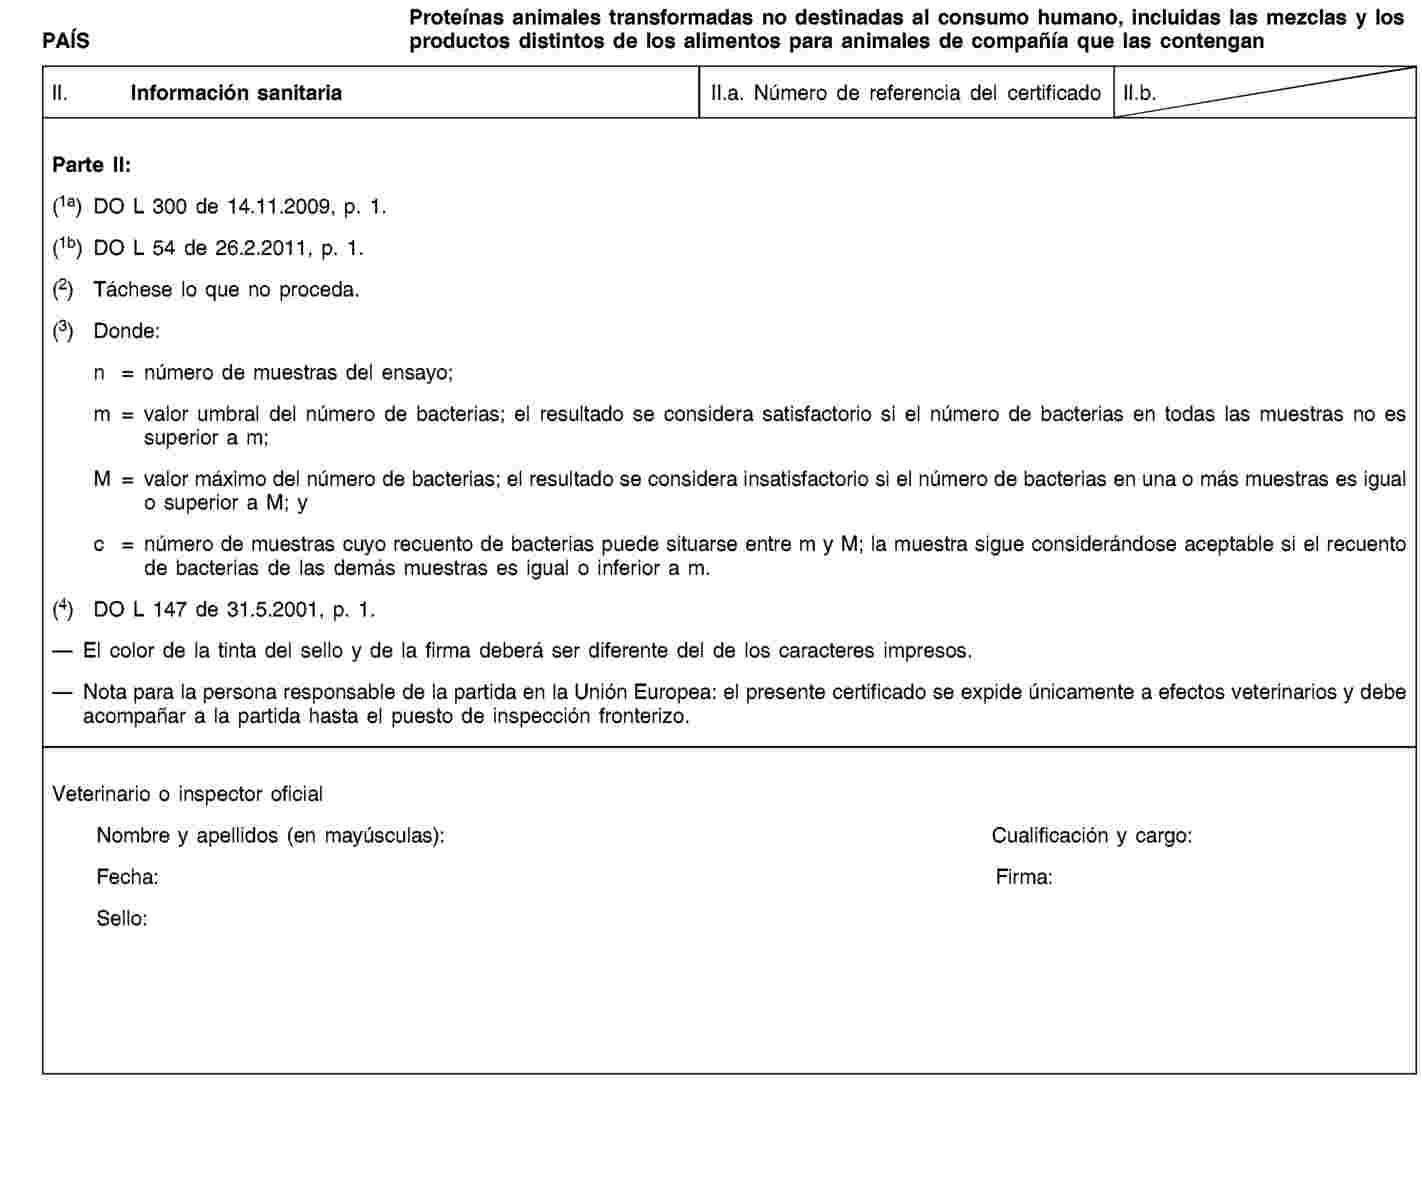 Imagen: https://eur-lex.europa.eu/resource.html?uri=uriserv:OJ.L_.2011.054.01.0001.01.SPA.xhtml.L_2011054ES.01012301.tif.jpg